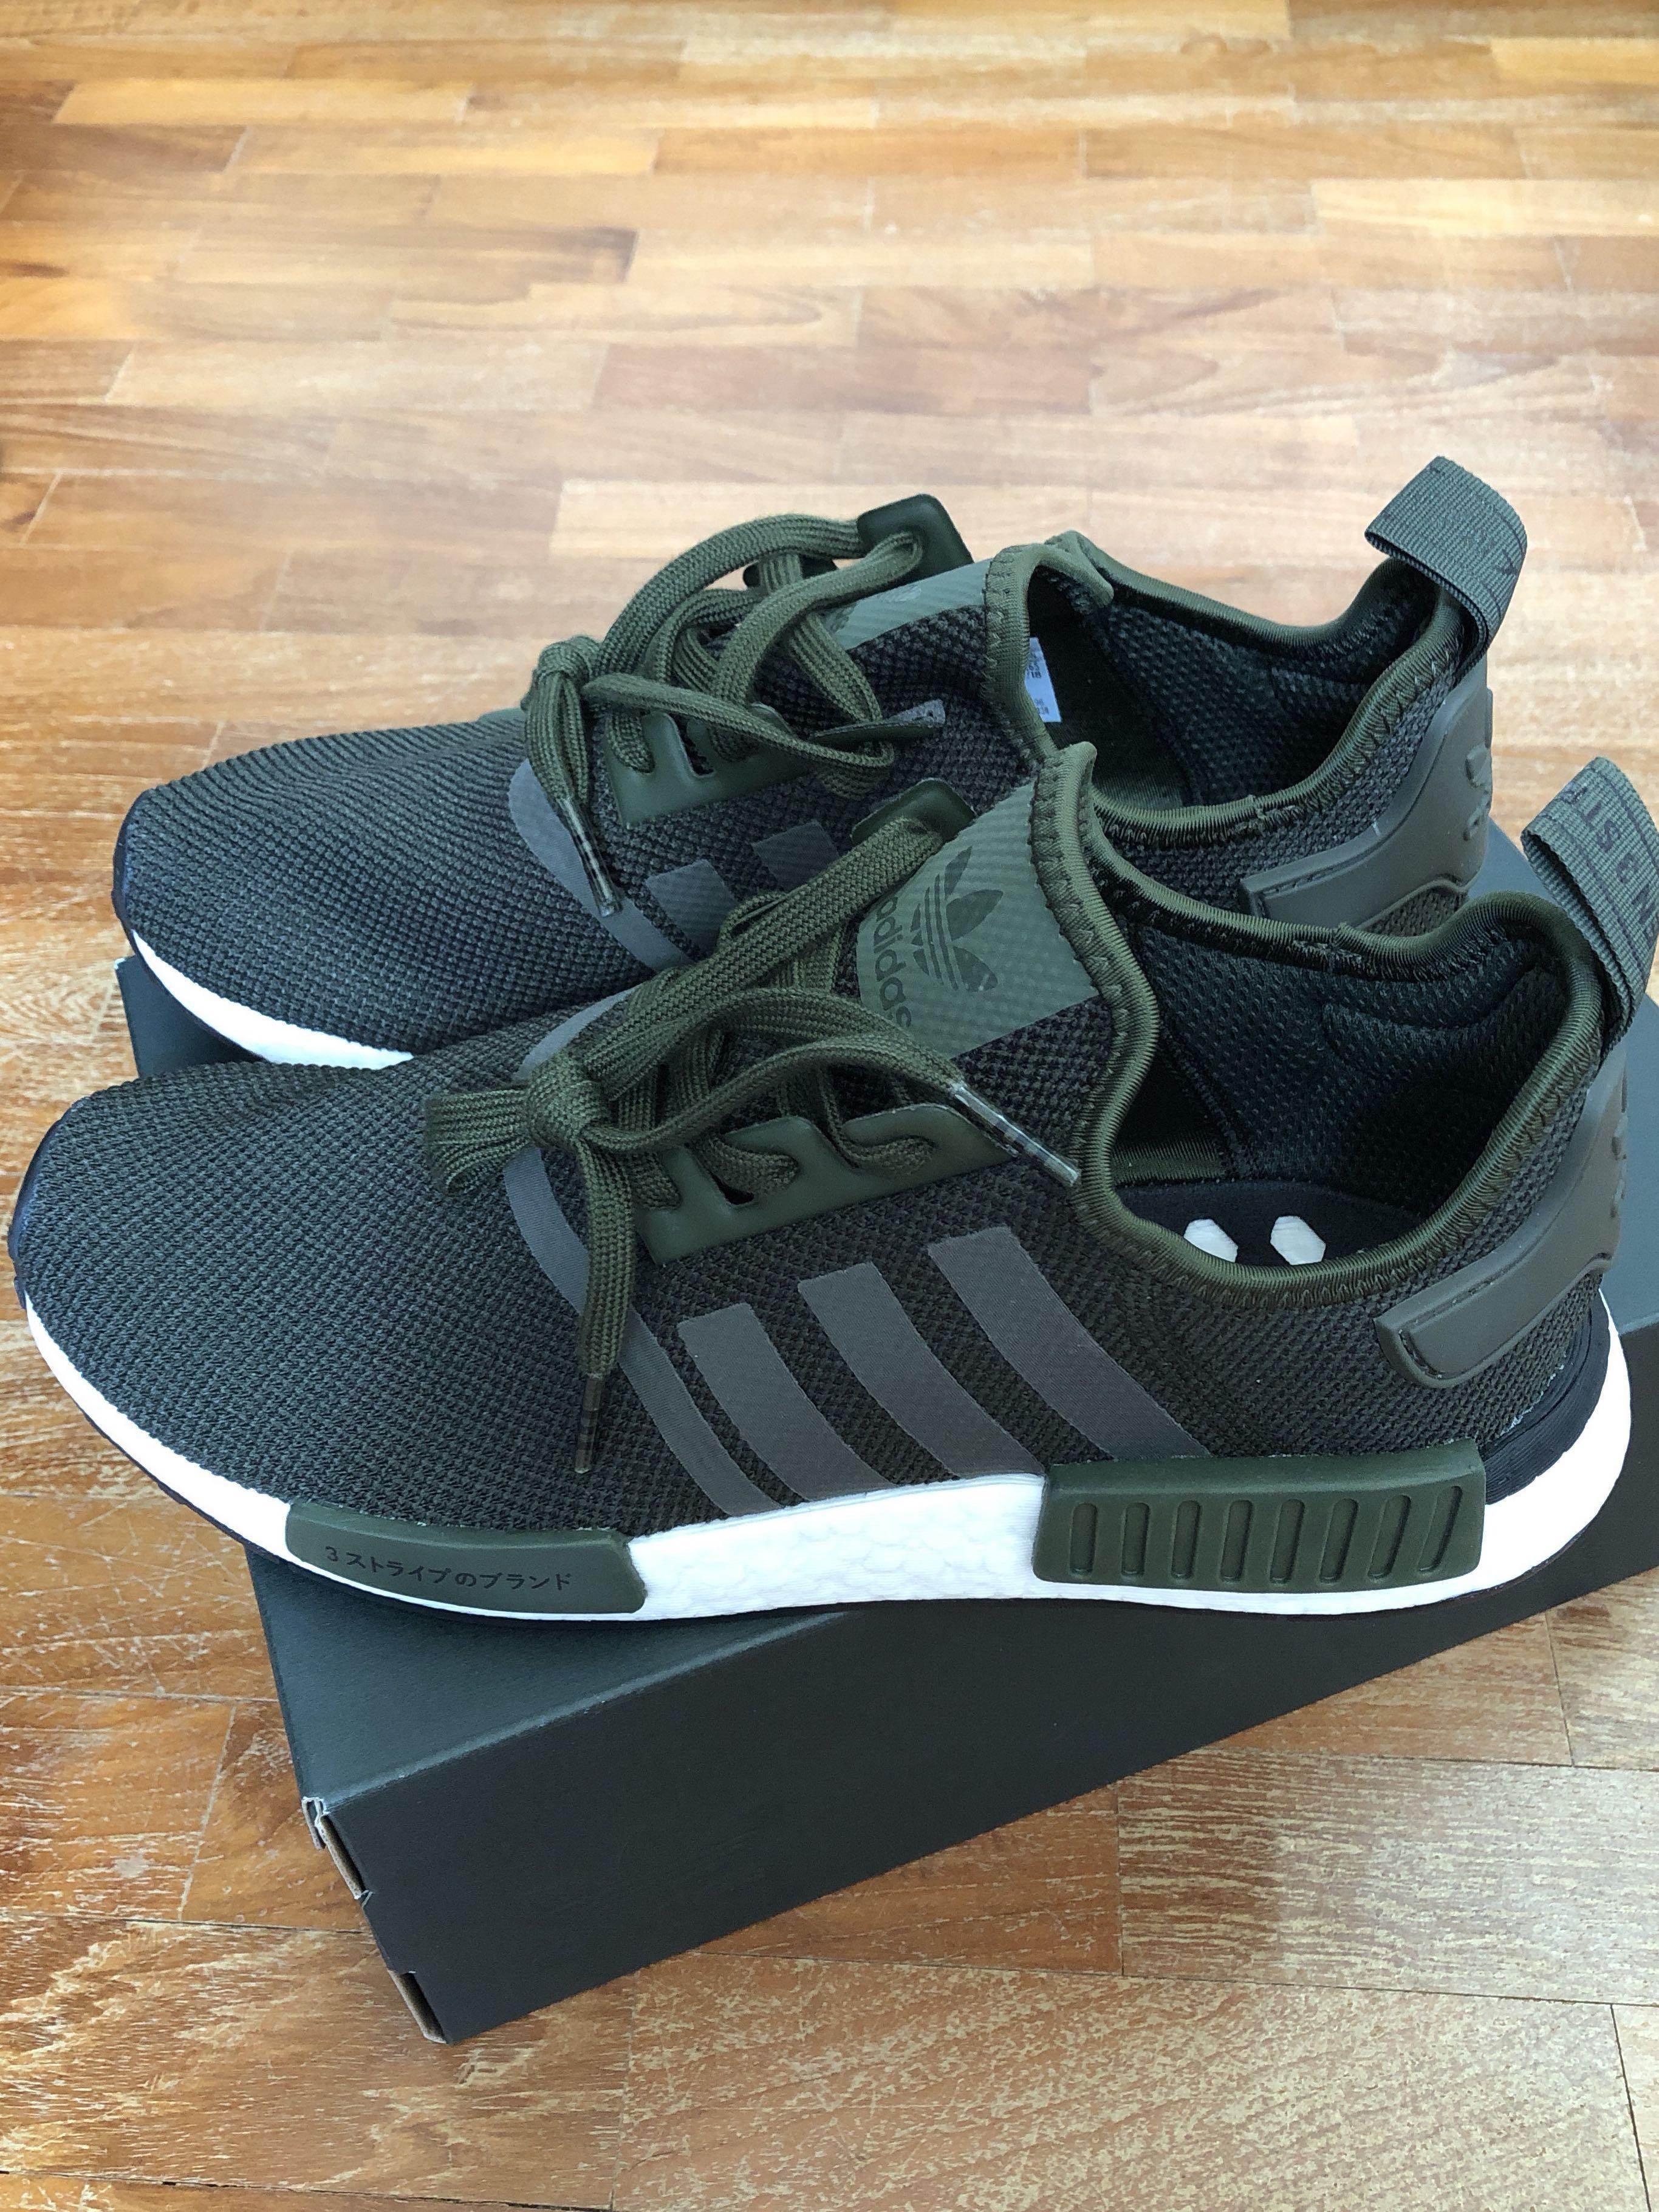 Adidas Nmd R1 Japan Edition Men S Fashion Footwear Sneakers